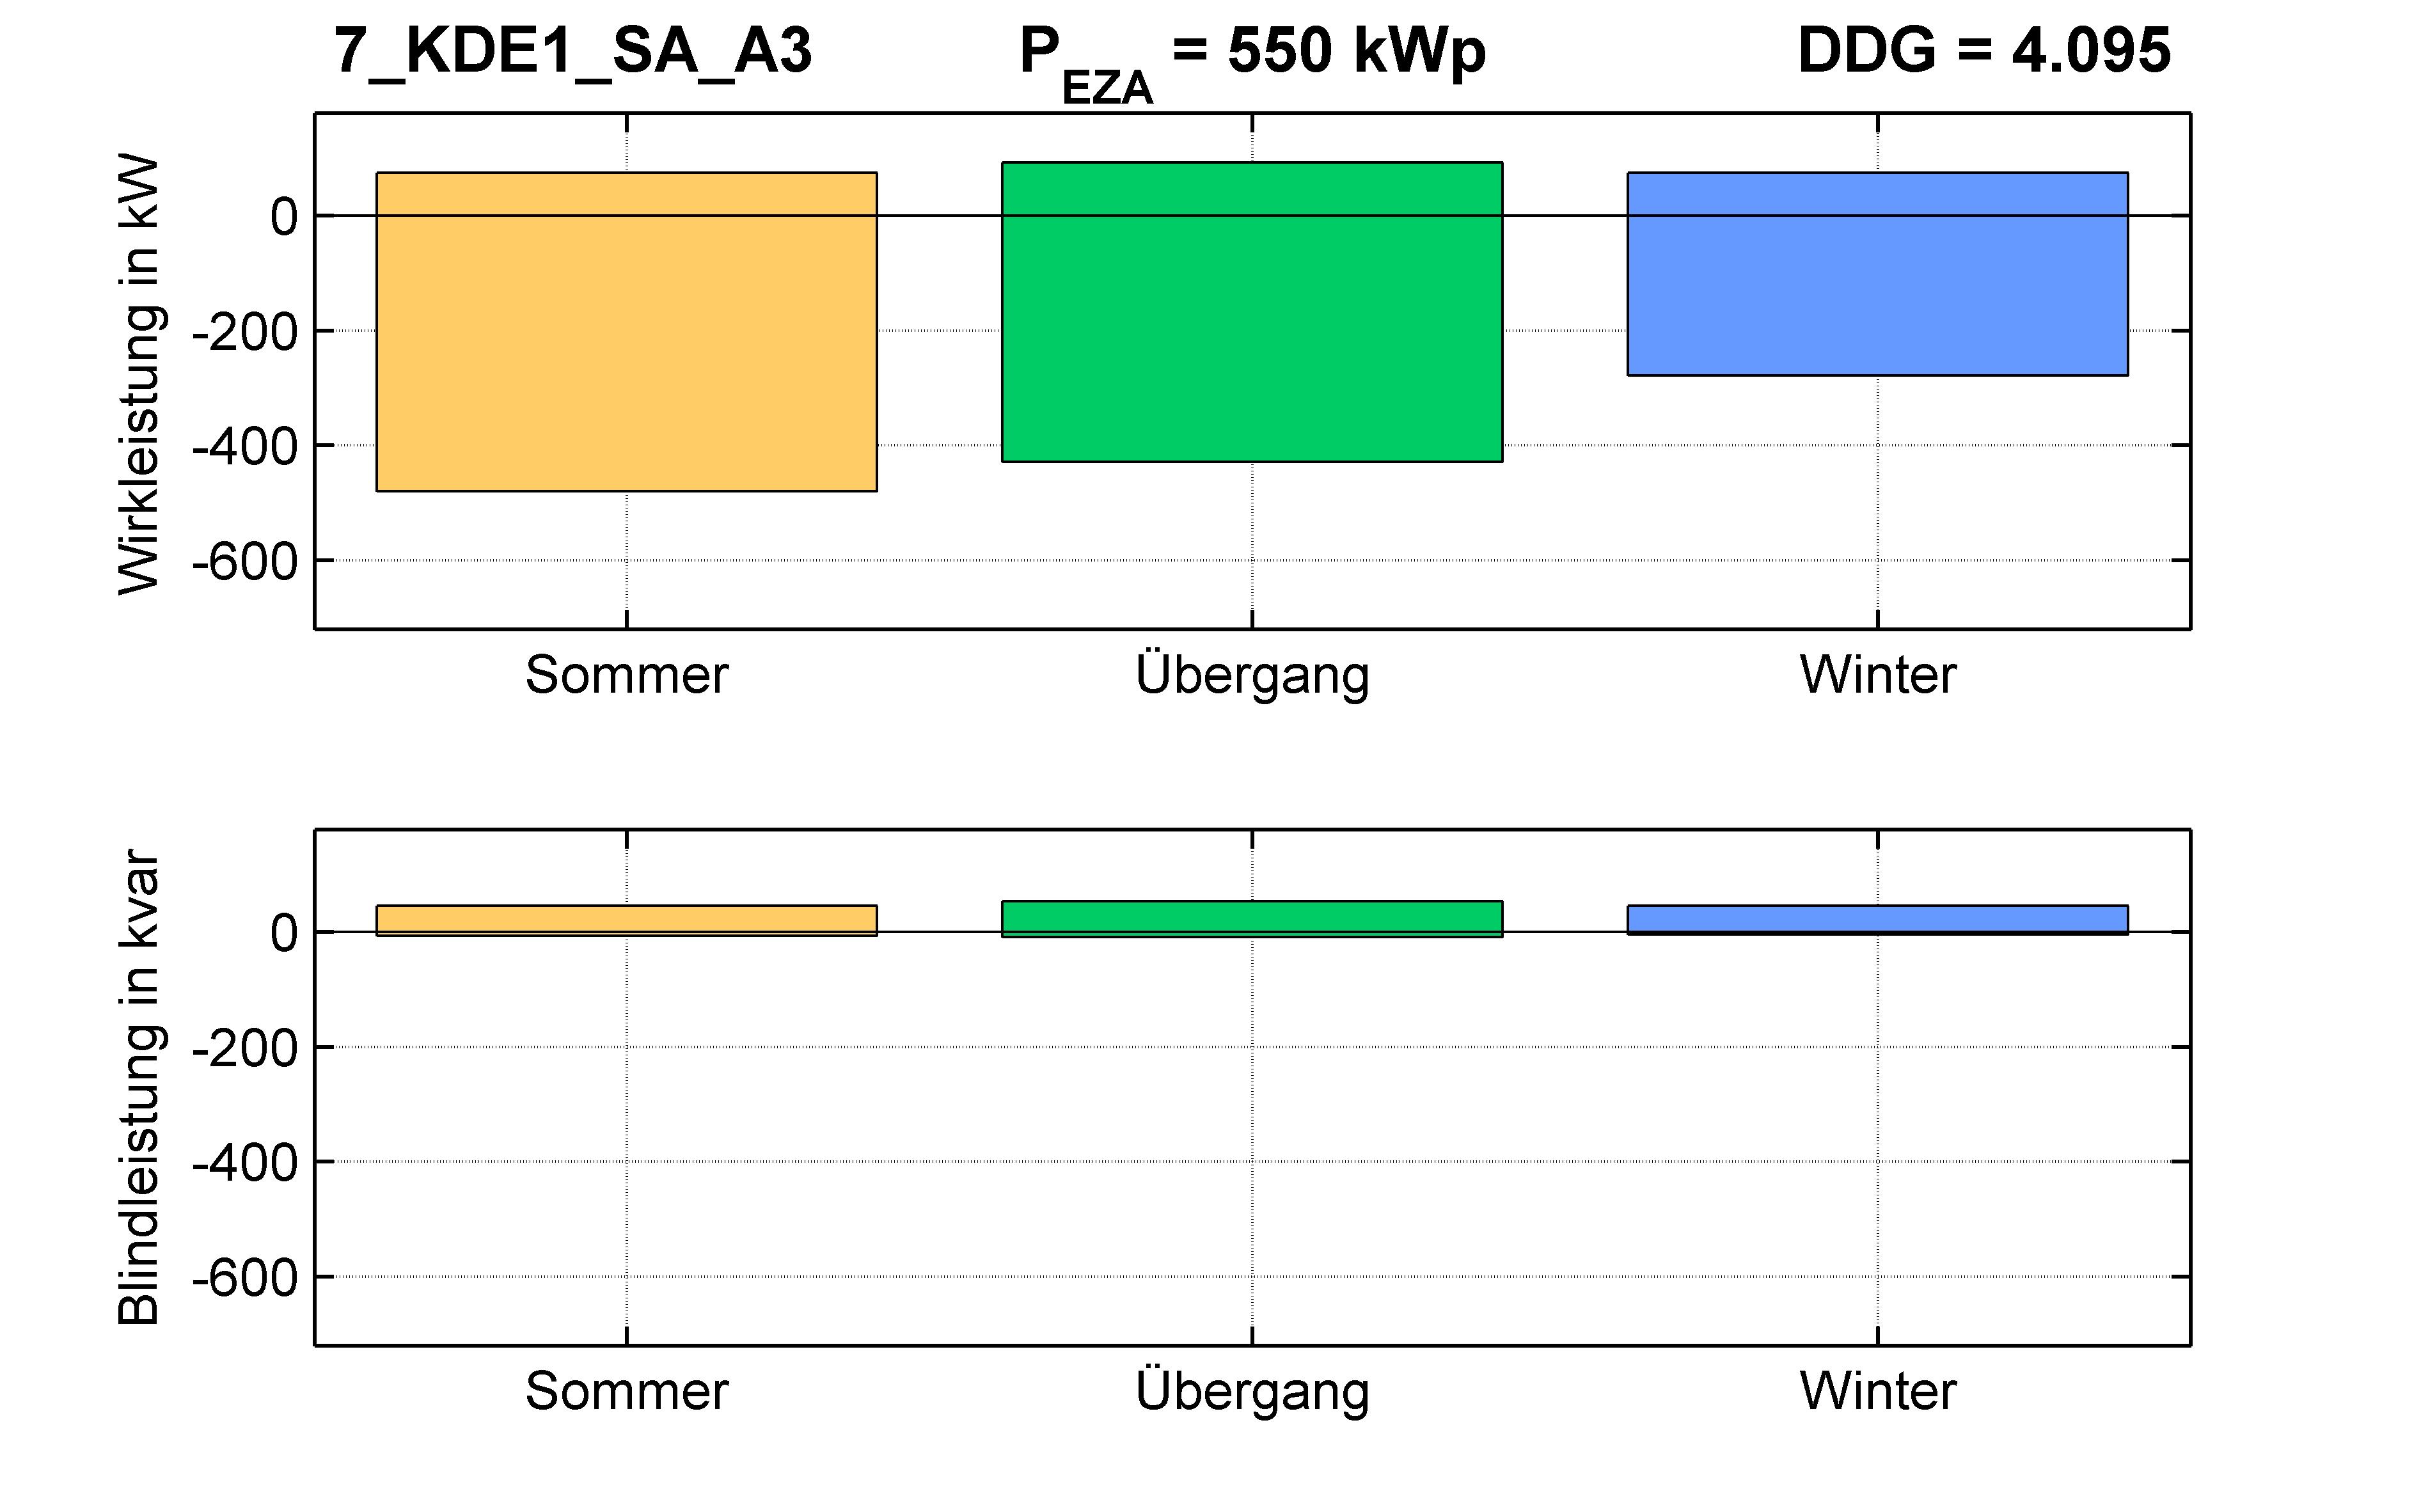 KDE1 | Längsregler (SA) A3 | PQ-Bilanz